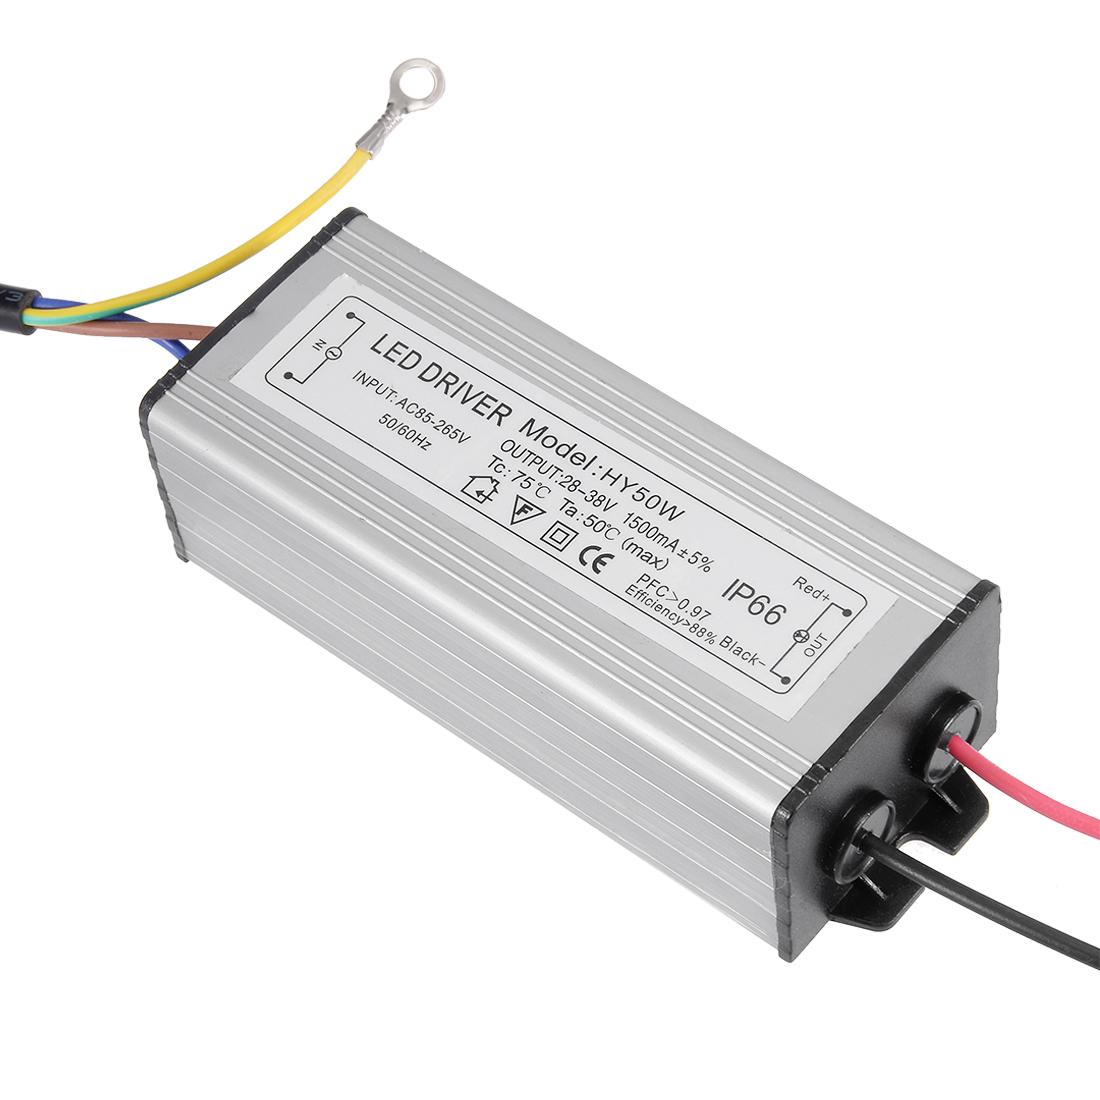 AC85-265V to DC 28-38V 50W Transformer IP66 Waterproof LED Driver Power Supply